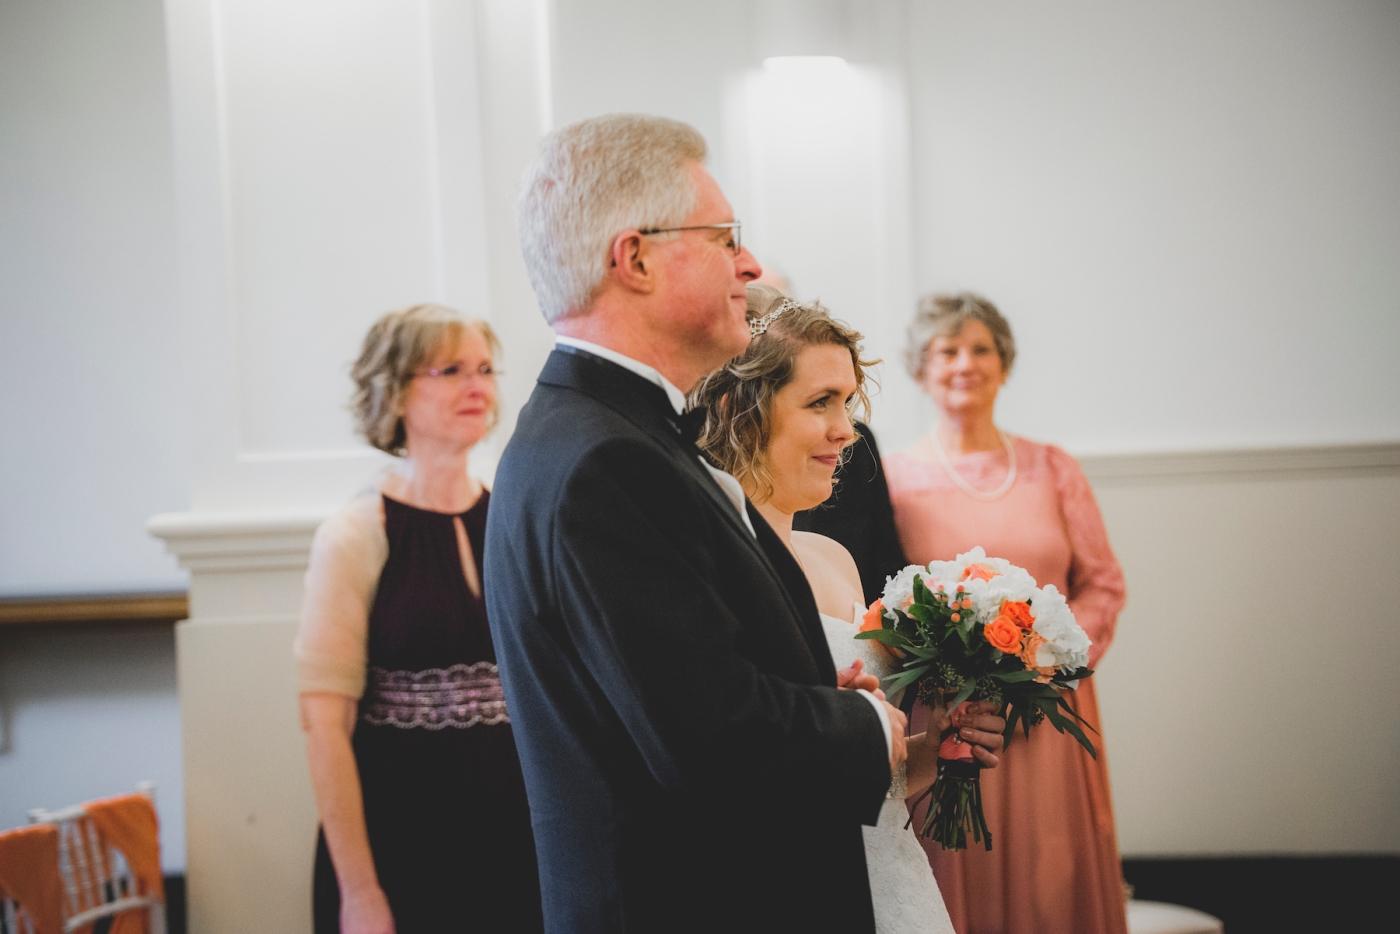 DSC_2570Everett_Wedding_Ballroom_Jane_Speleers_photography_Rachel_and_Edmund_Ceremony_2017